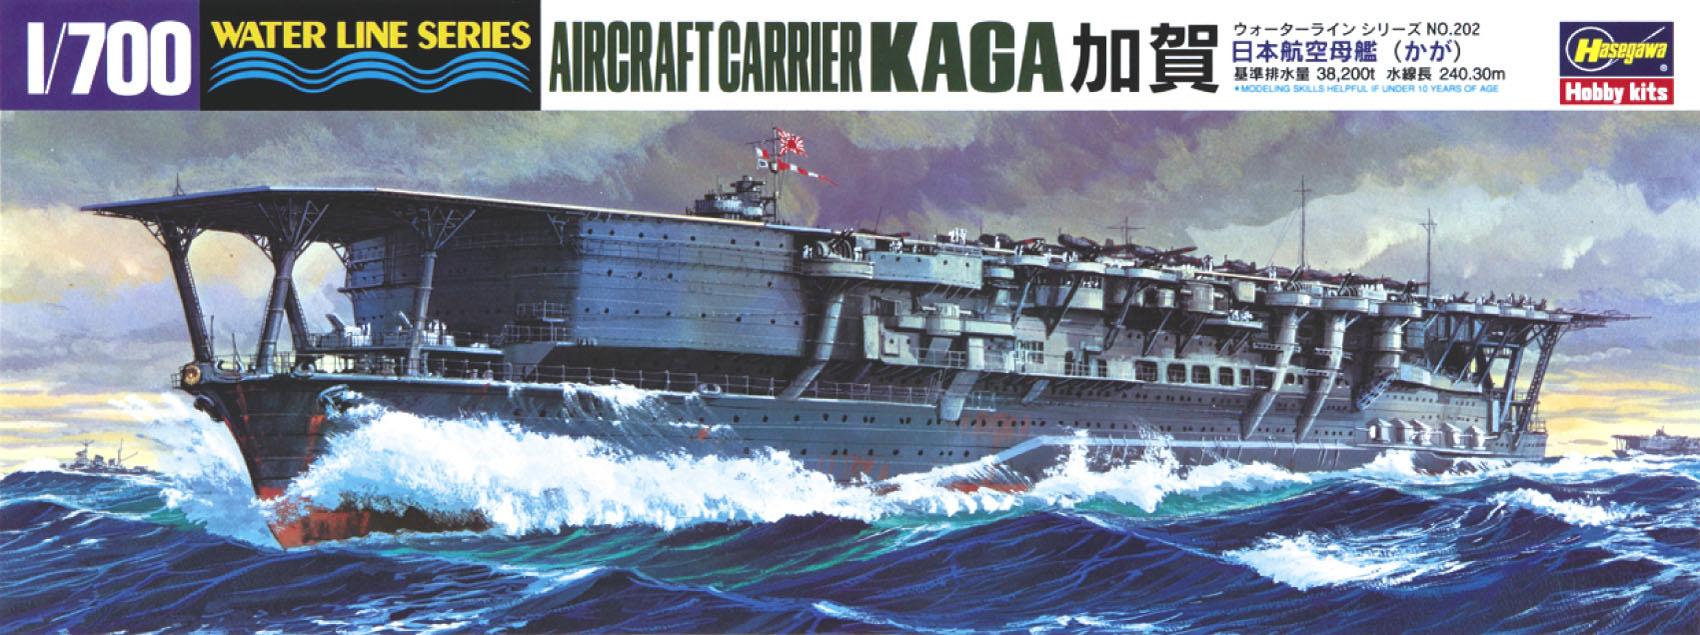 Hasegawa 1/700 Aircraft Carrier Kaga